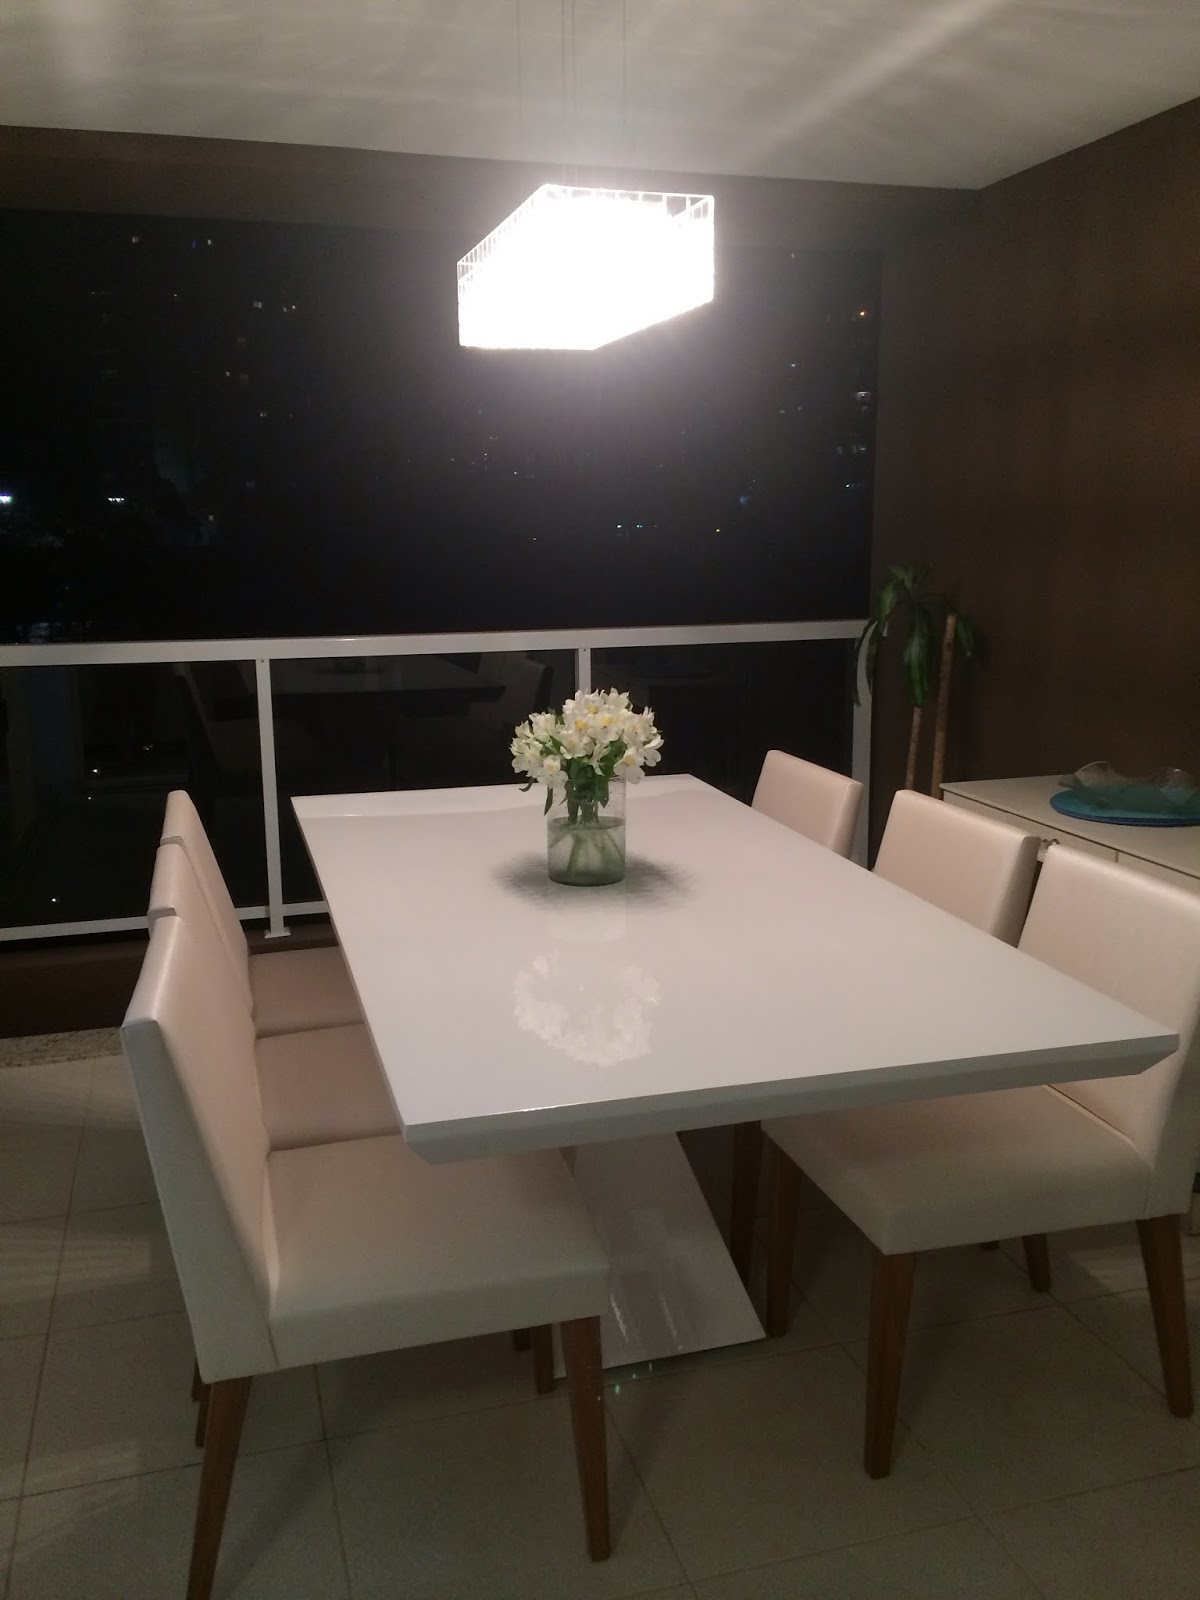 Cadeira Para Sala De Jantar Branca ~  Mesa de Jantar em resina sob medida varios modelos e cores Branca